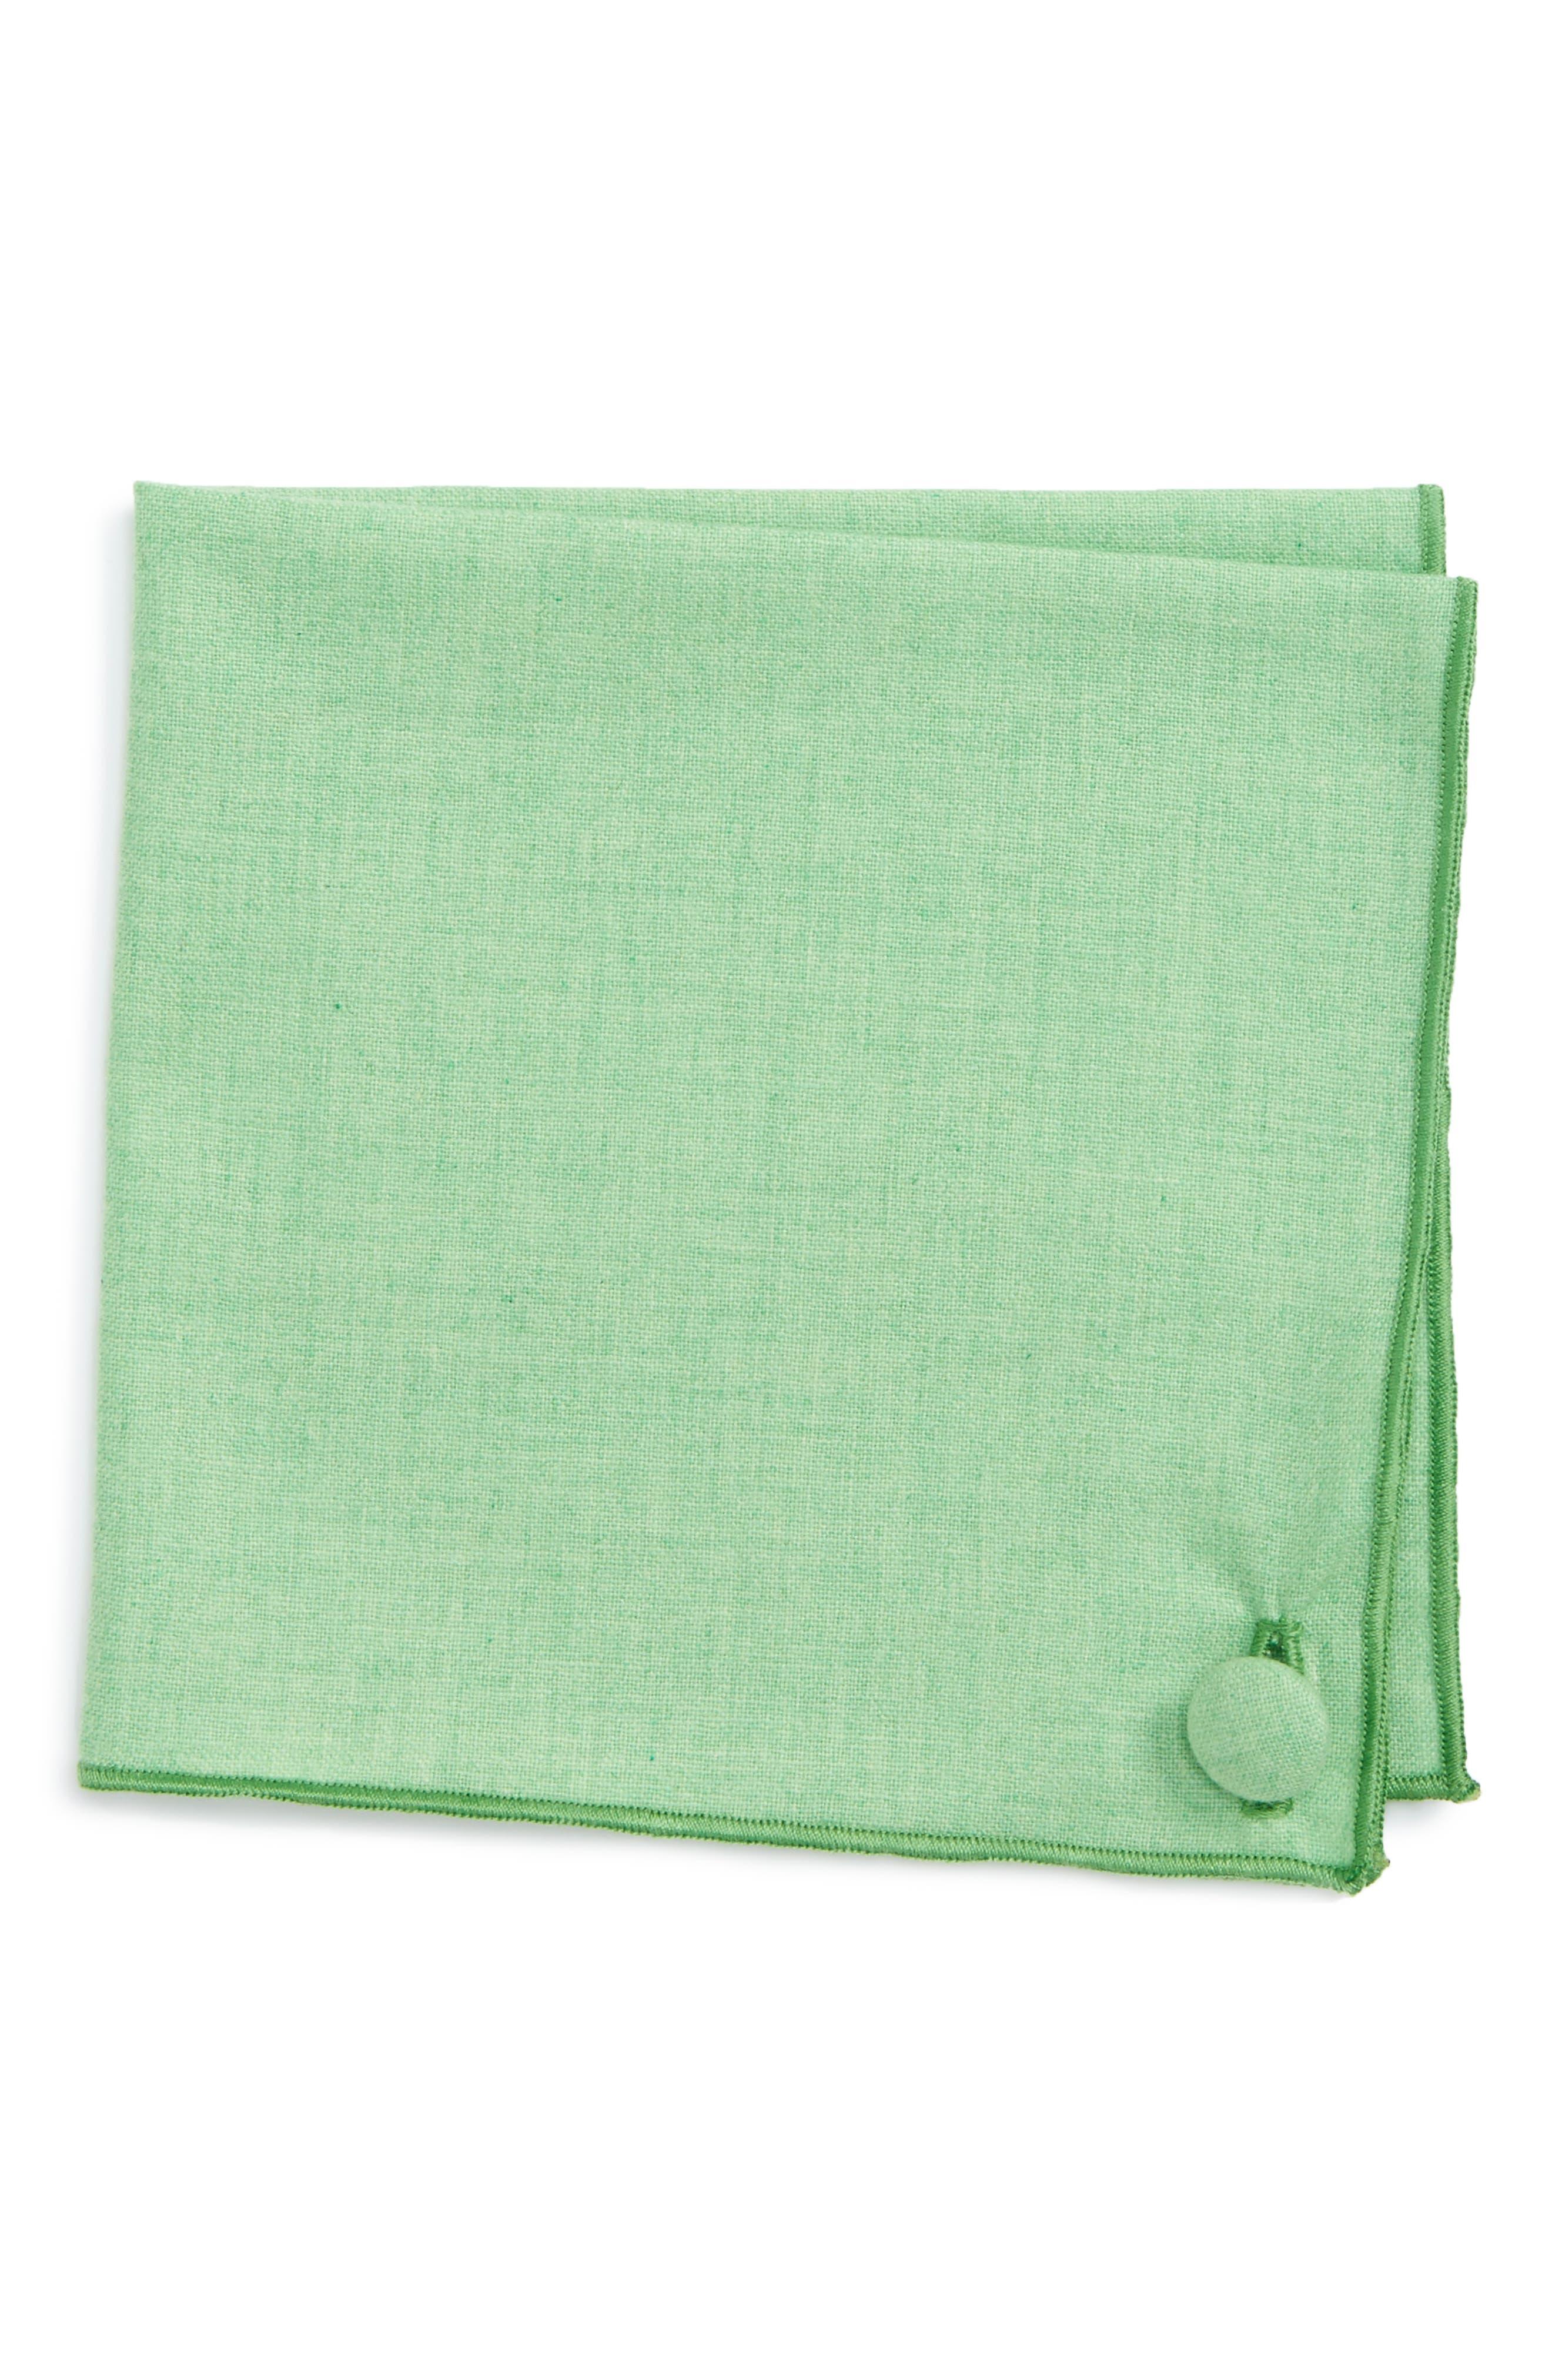 Solid Wool Pocket Square,                             Main thumbnail 1, color,                             300